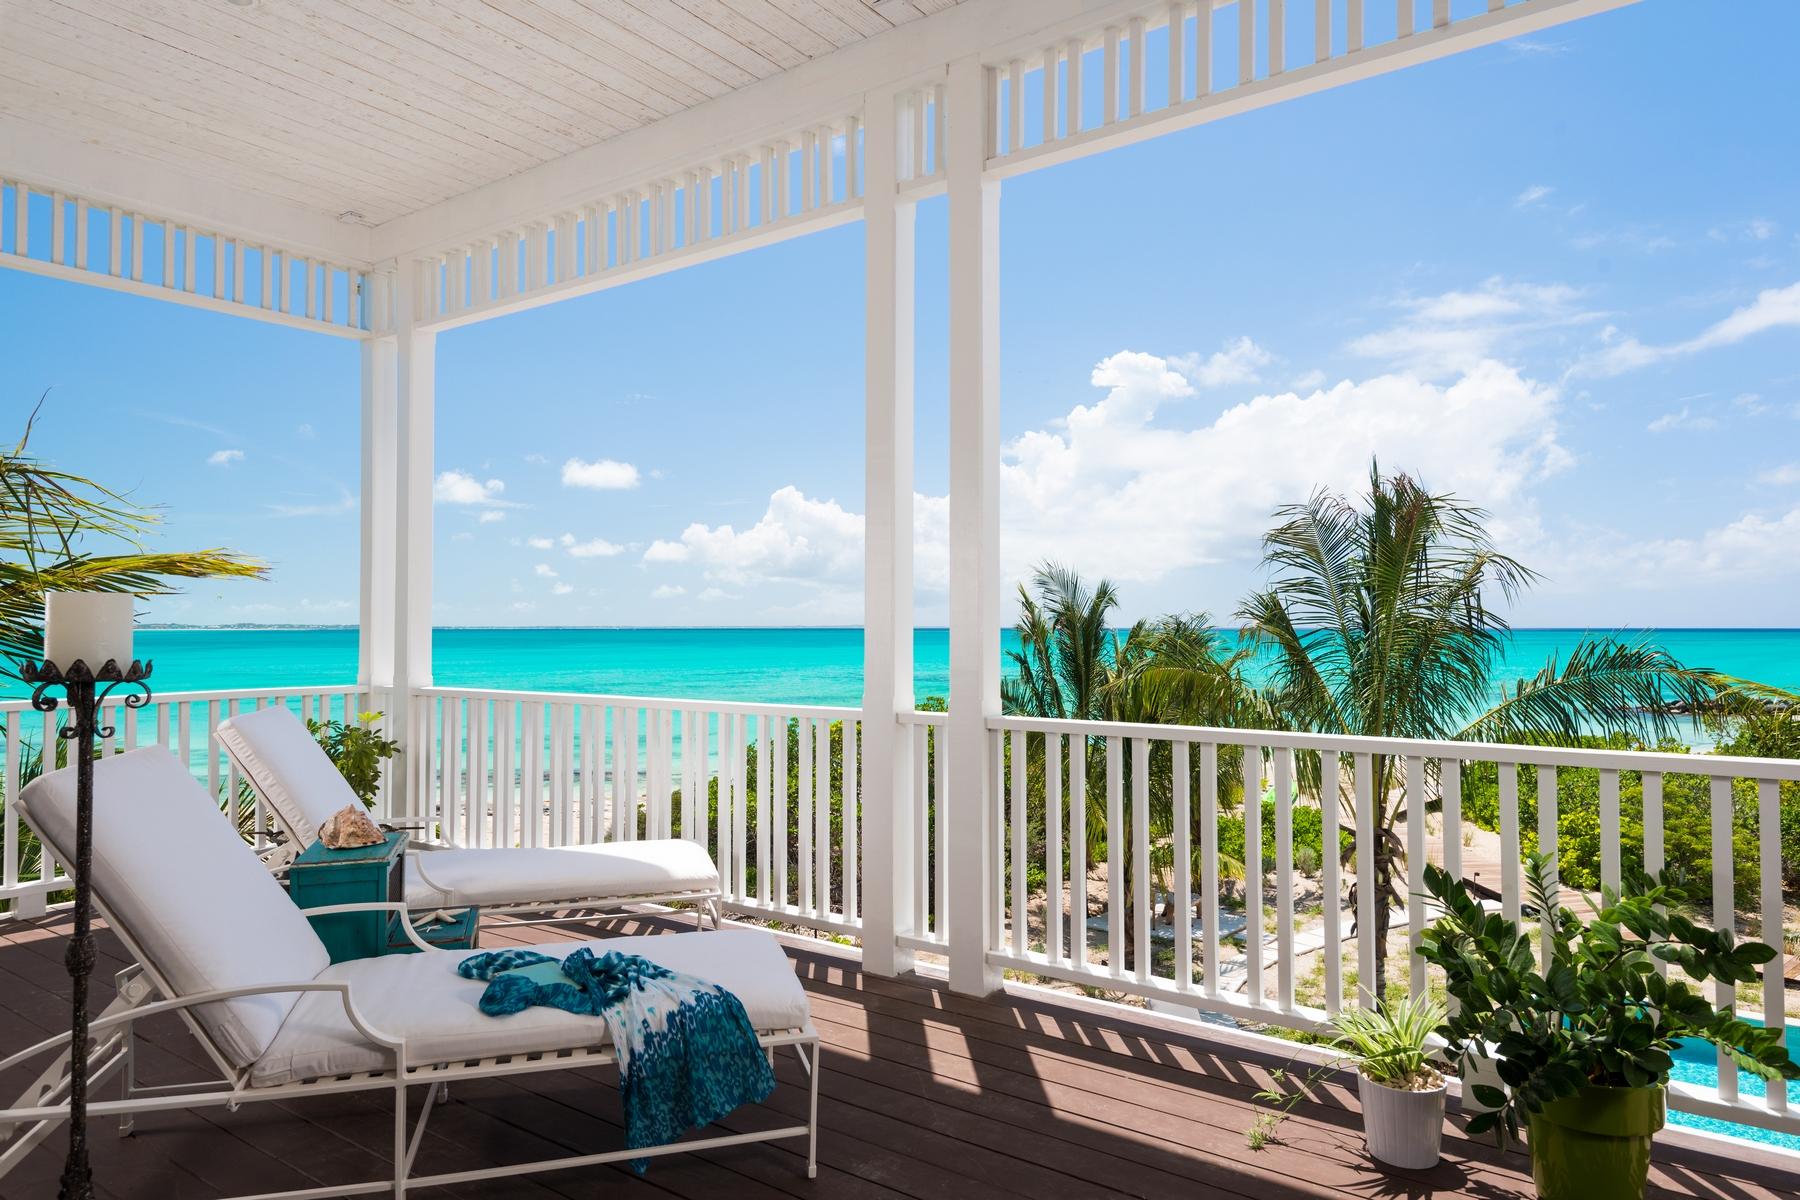 Additional photo for property listing at Saving Grace - Luxurious Beachfront Villa  格蕾斯湾, 普罗维登夏 TCI BWI 特克斯和凯科斯群岛